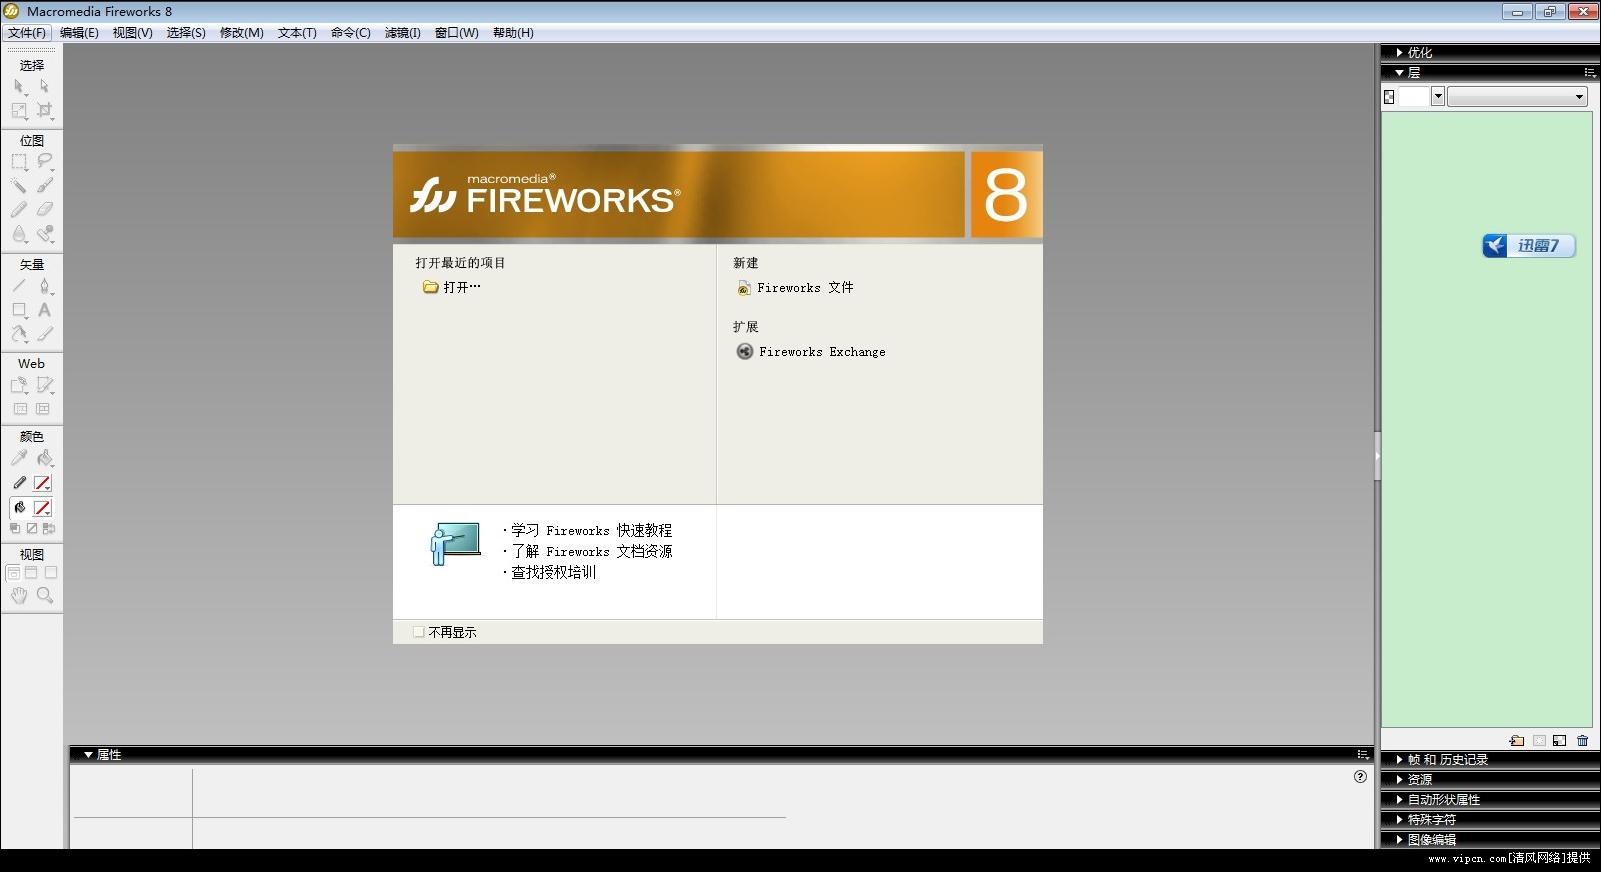 fireworks8简体中文版 中文版